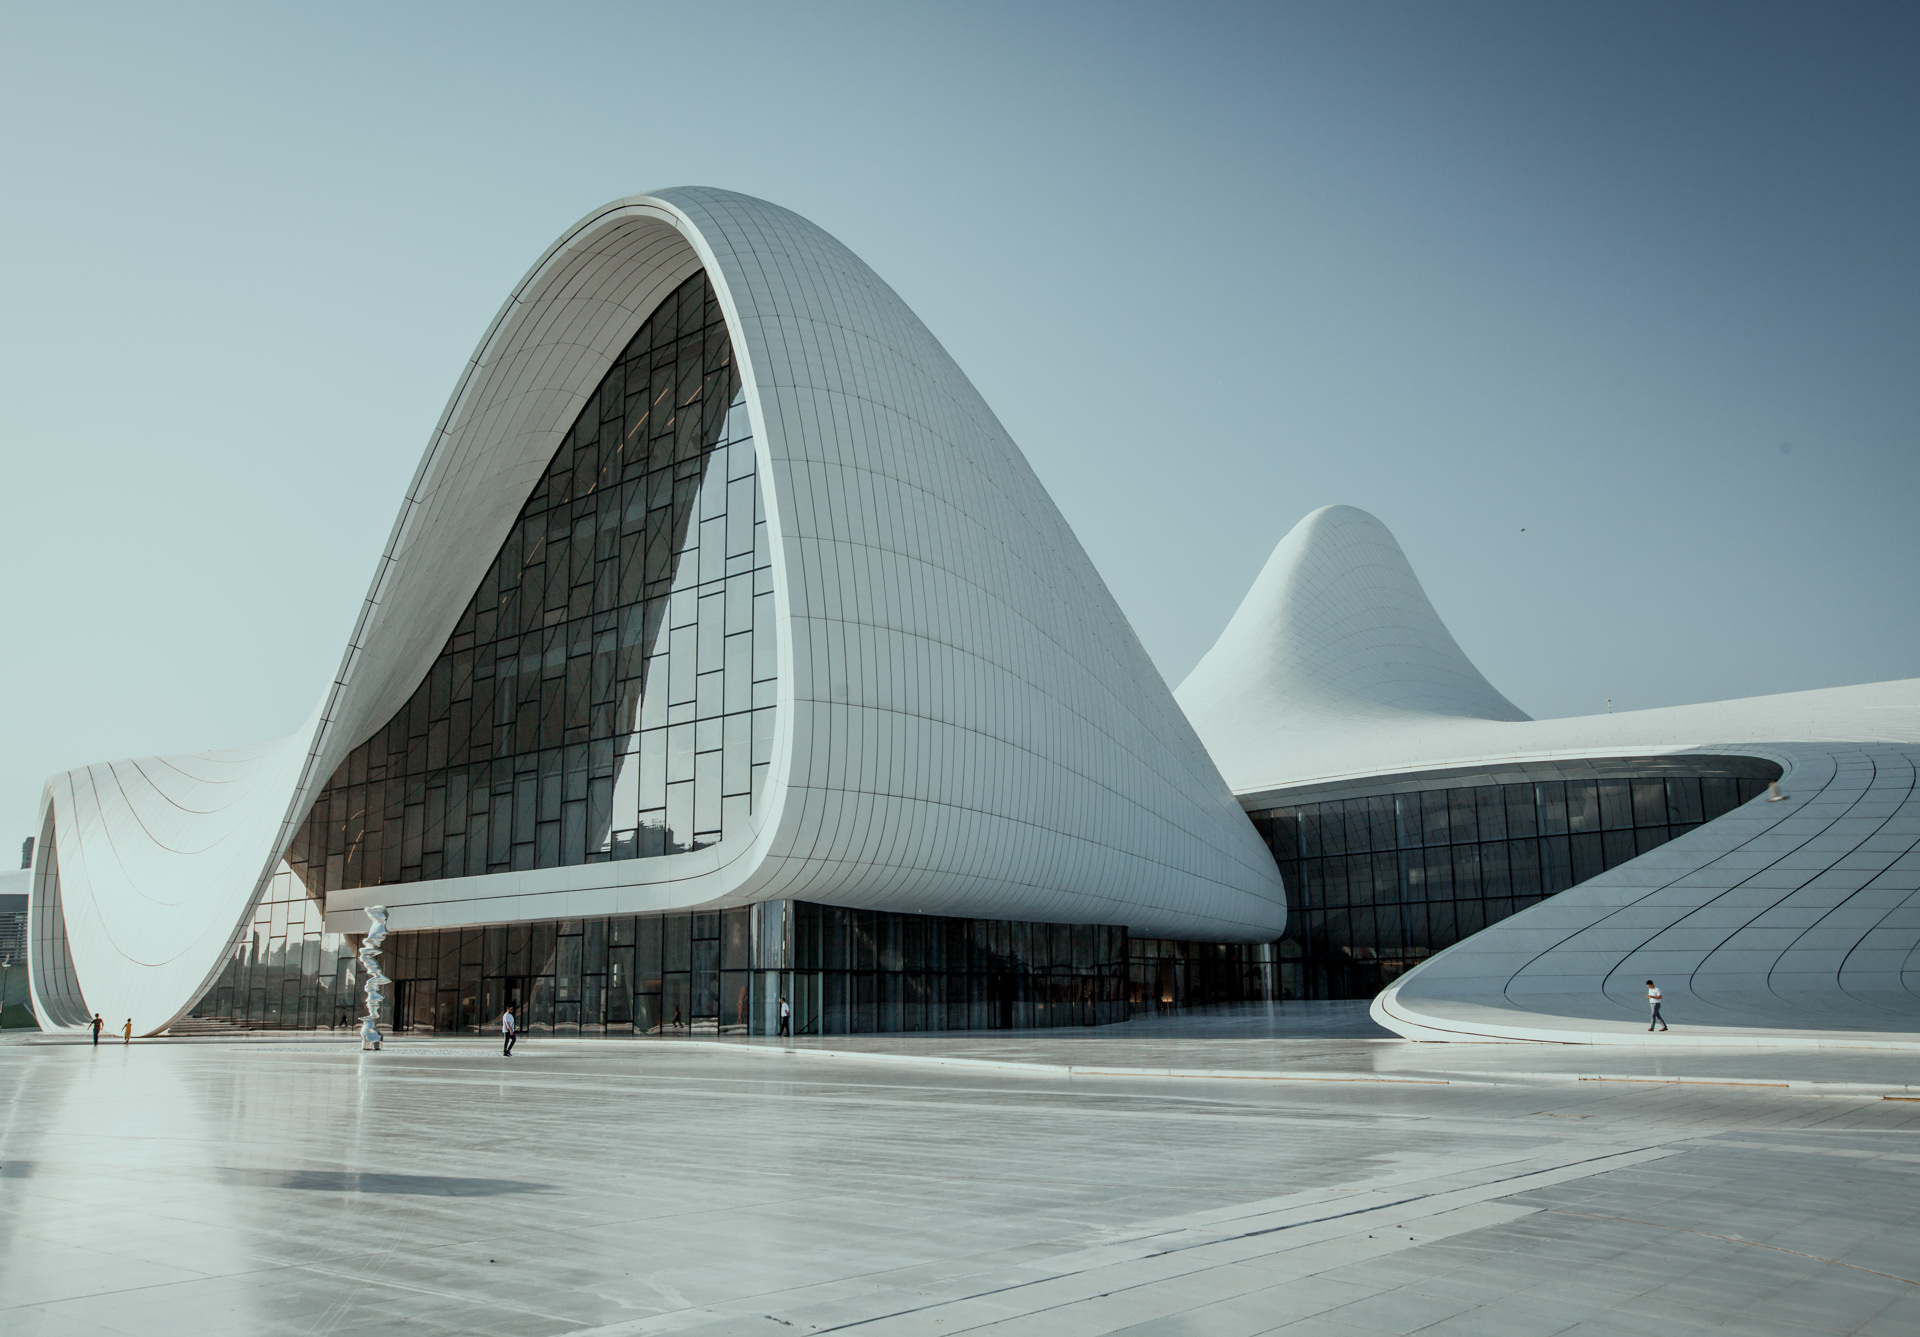 Baku futurystyczne budowle